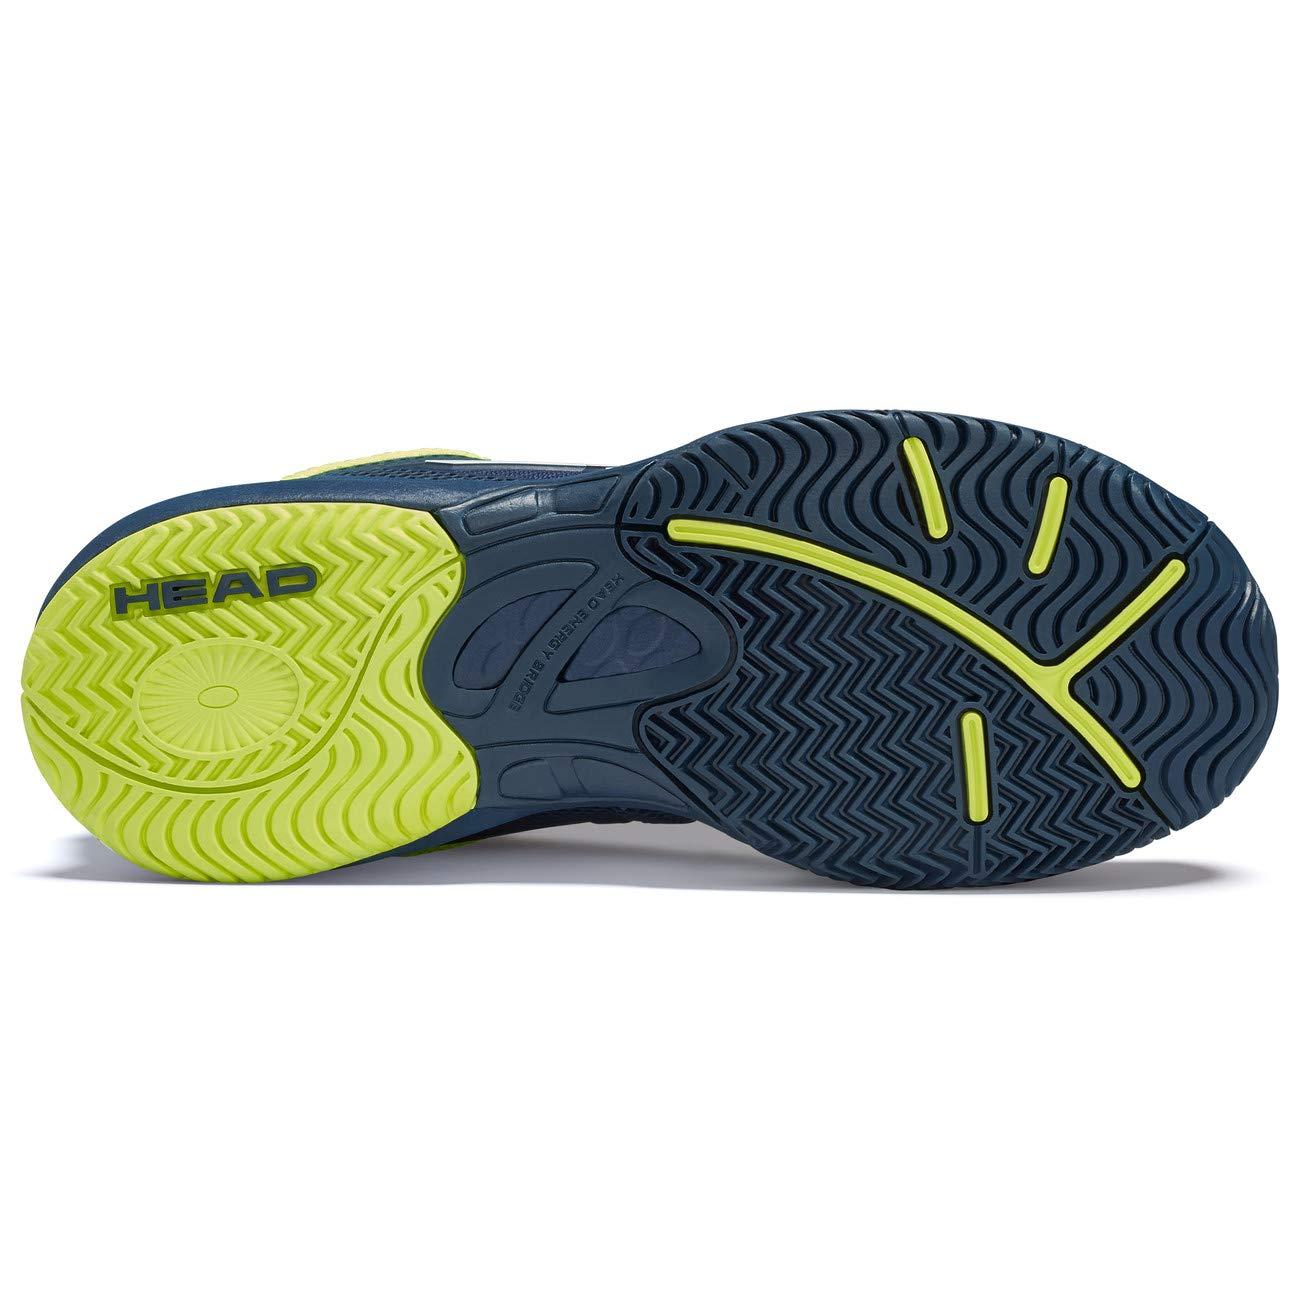 Scarpe Unisex 2 Junior Tennis Da 5 Revolt Bambini Pro Calzature Head Fcl13KJT